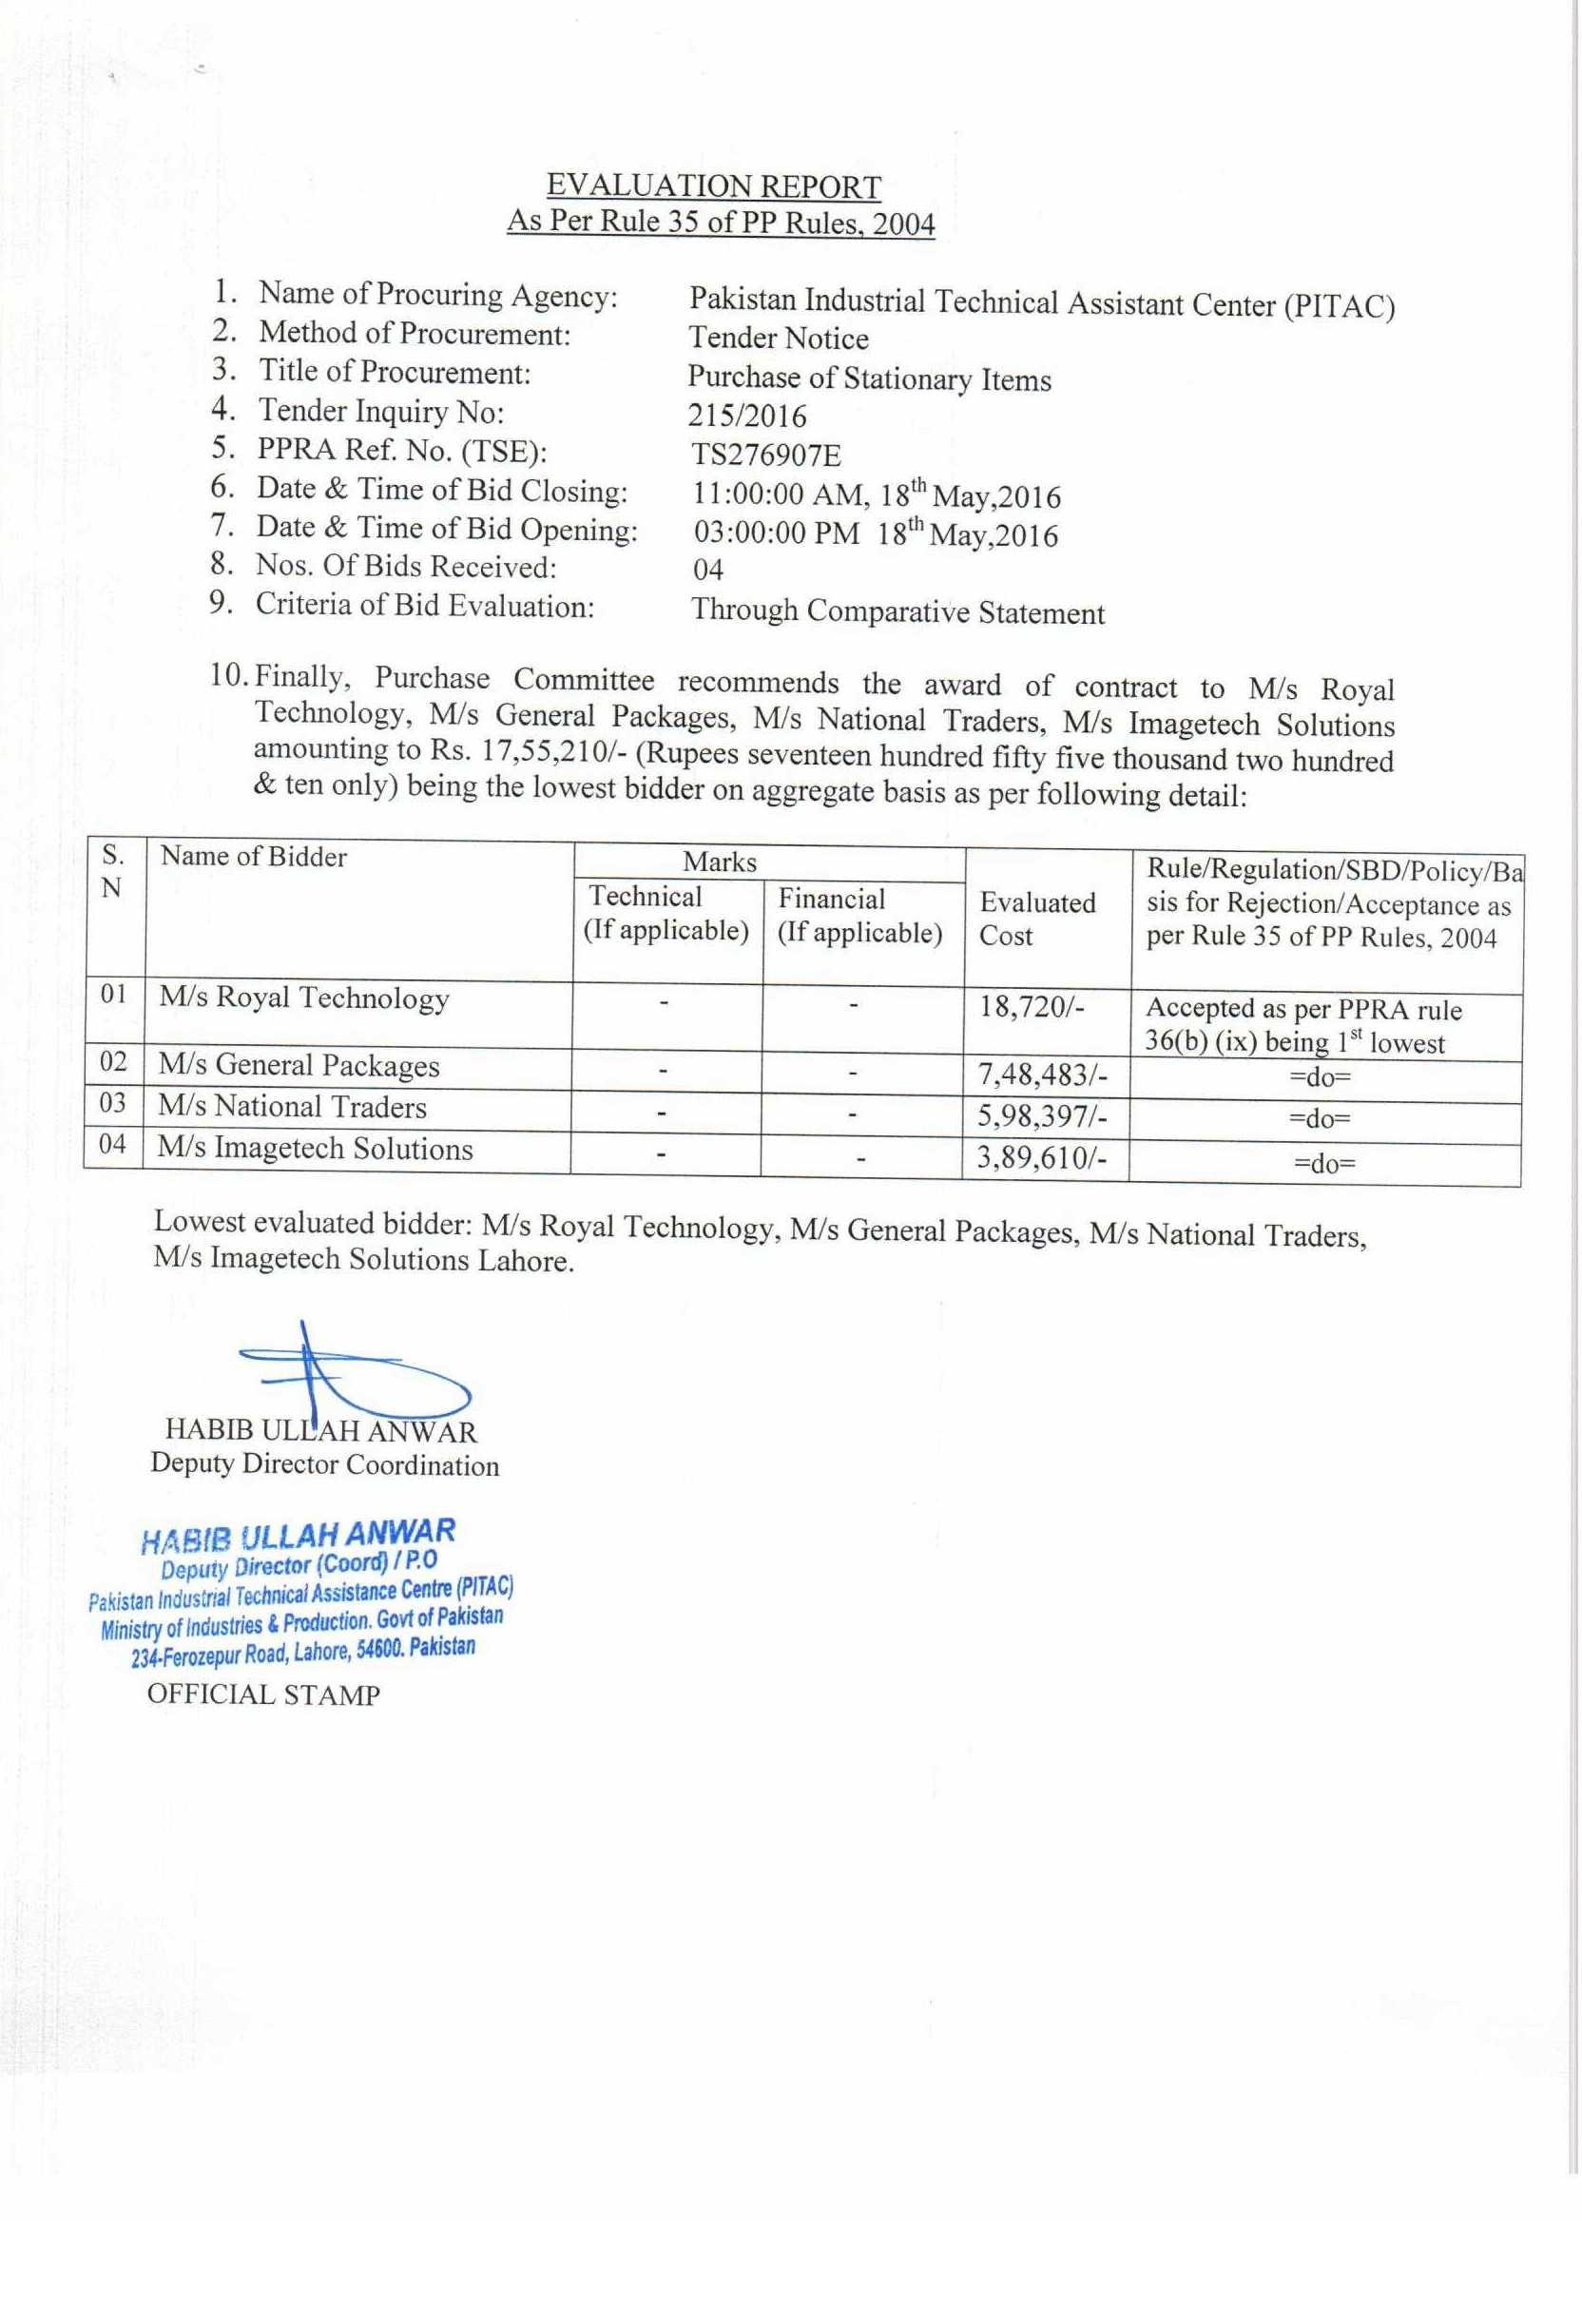 Pakistan Industrial Technical Assistance Centre (PITAC)